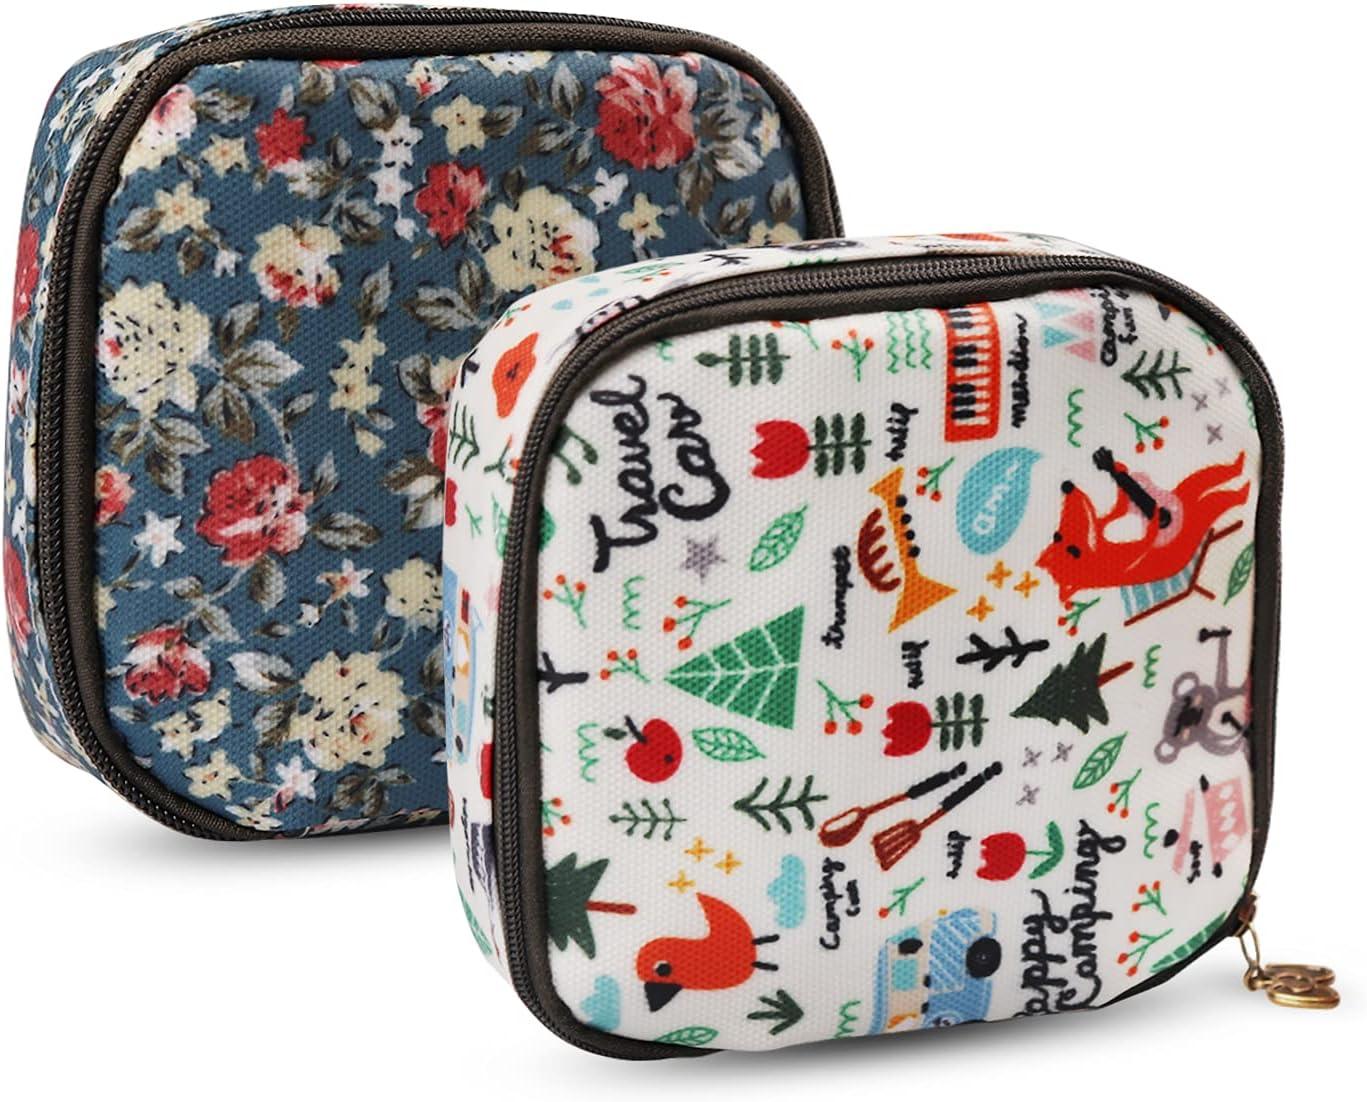 Tuciyke Sanitary Napkin Storage Bag Limited time trial price S Cloth Cotton 2pcs Superior